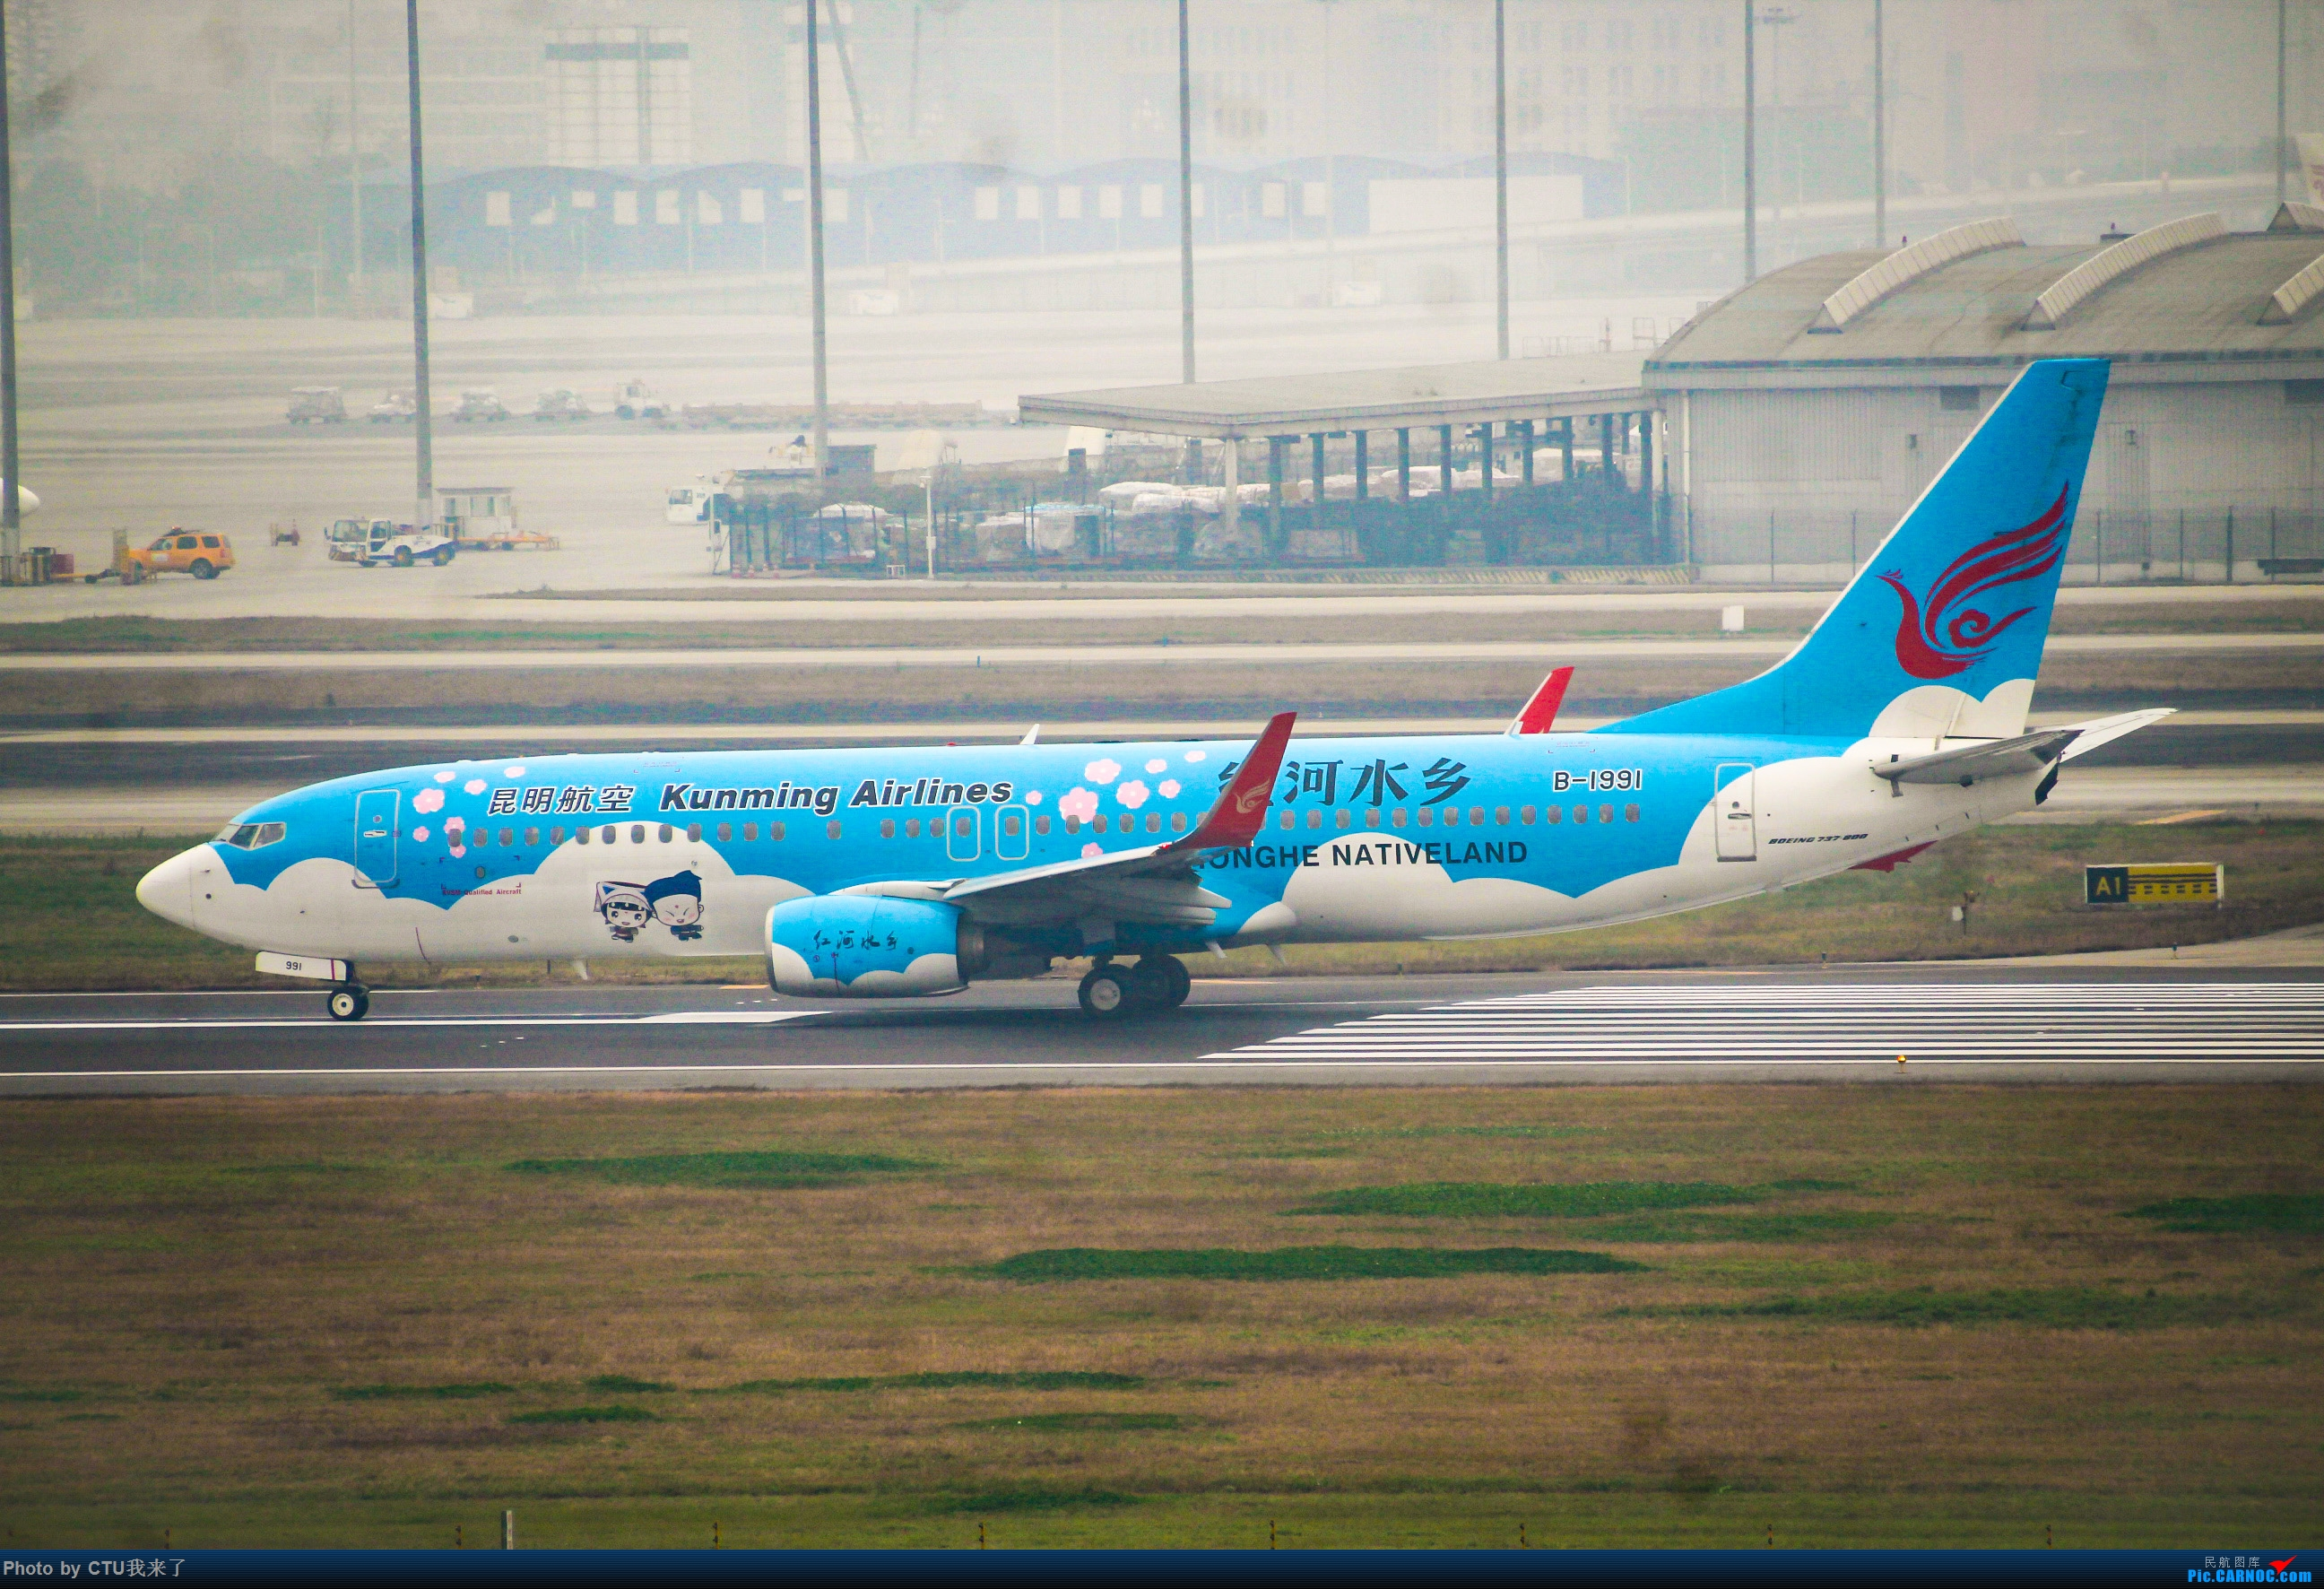 Re:[原创]CTU水泥天拍机,验证烂天好货的铁律 BOEING 737-800 B-1991 中国成都双流国际机场